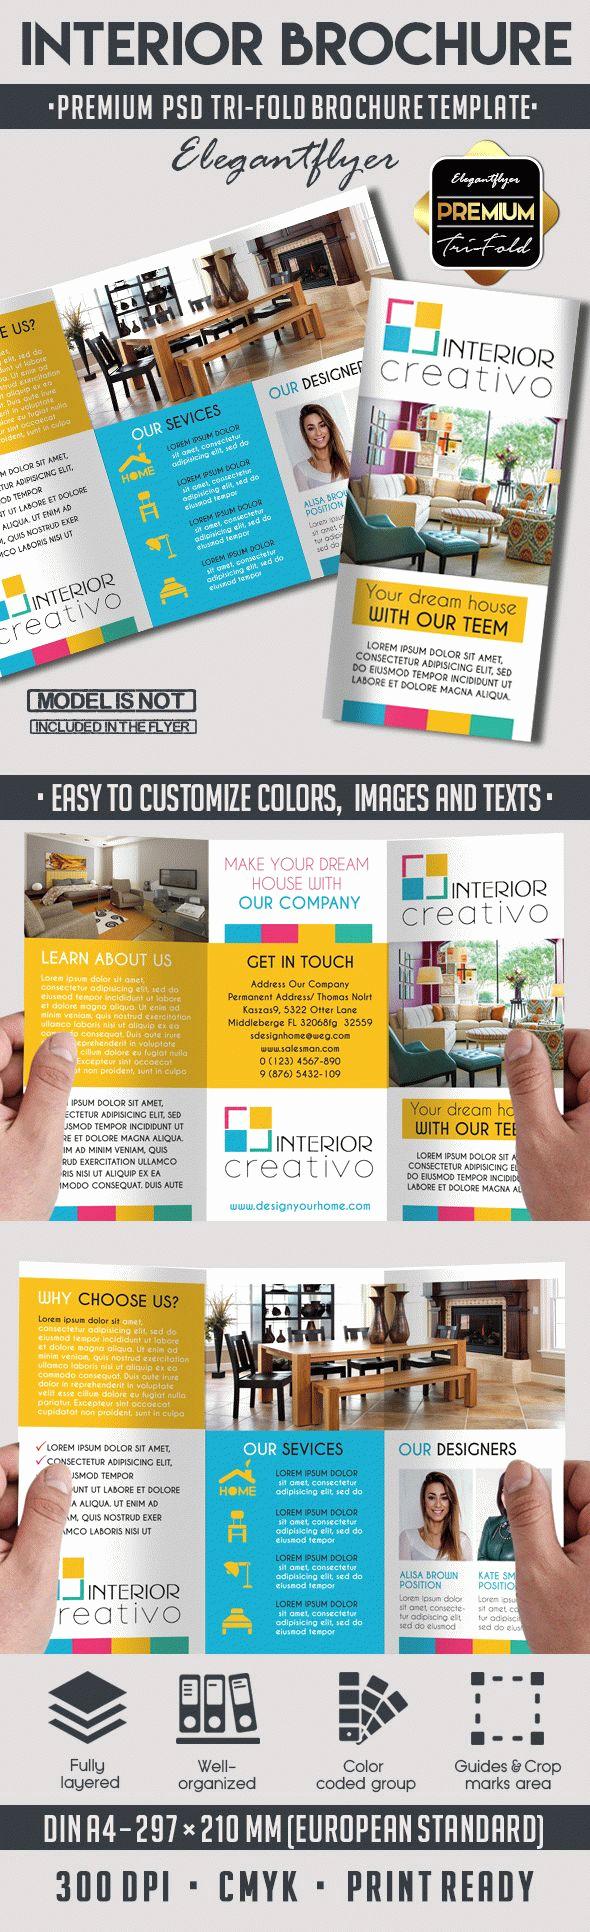 Tri Fold Brochure Template Psd Beautiful Interior – Premium Tri Fold Psd Brochure Template – by